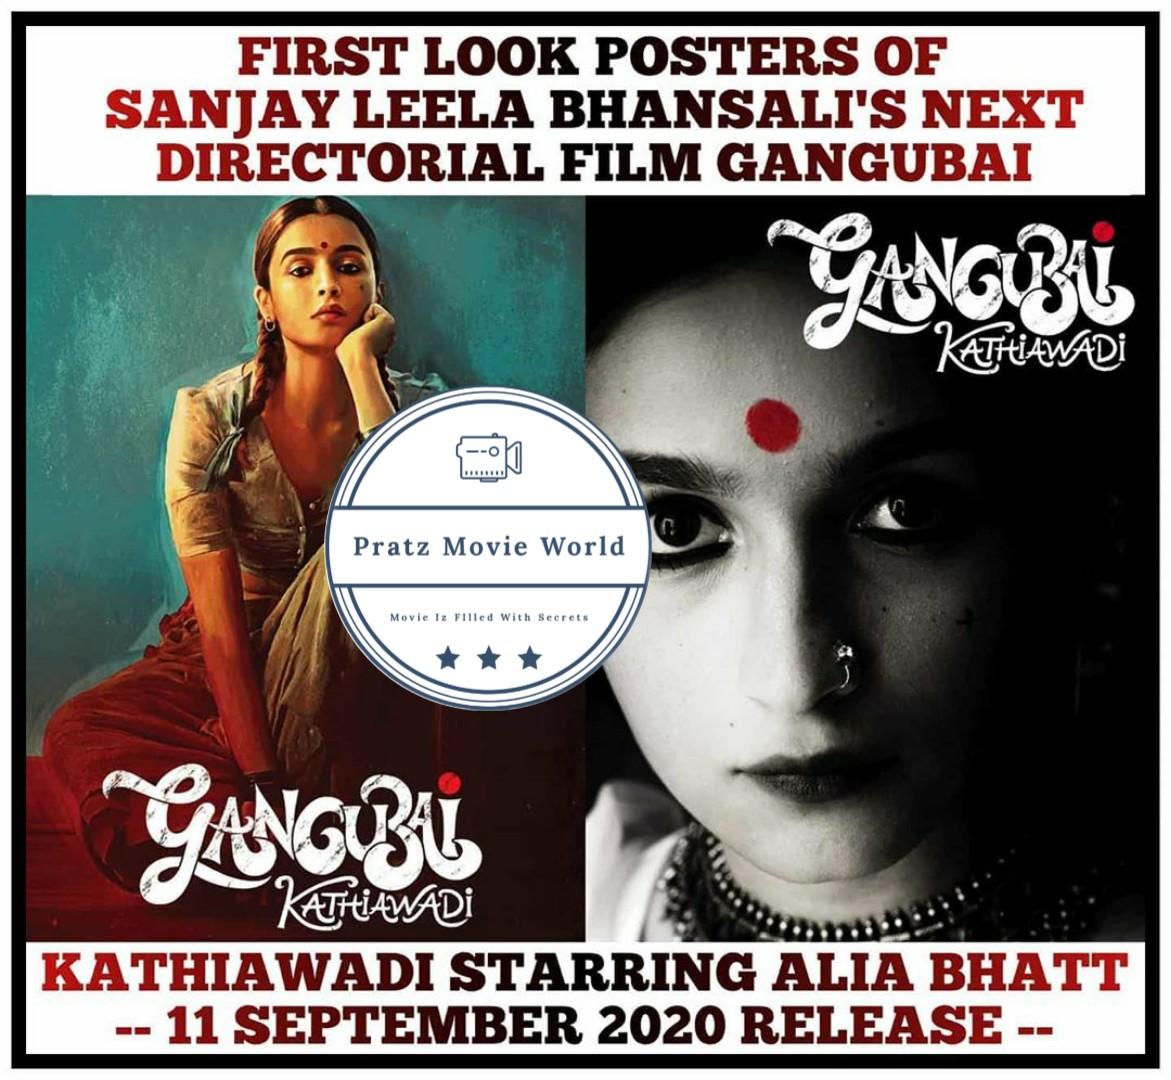 Gangubaii Kathiwadi #alia #aliabhatt #sanjayleelabhansali #upcomingmovies #2021 #gangubai #maharashtra #epic #drama #likeforlikes #liked #followforfollowback #following pic.twitter.com/dzmpK1X3o3